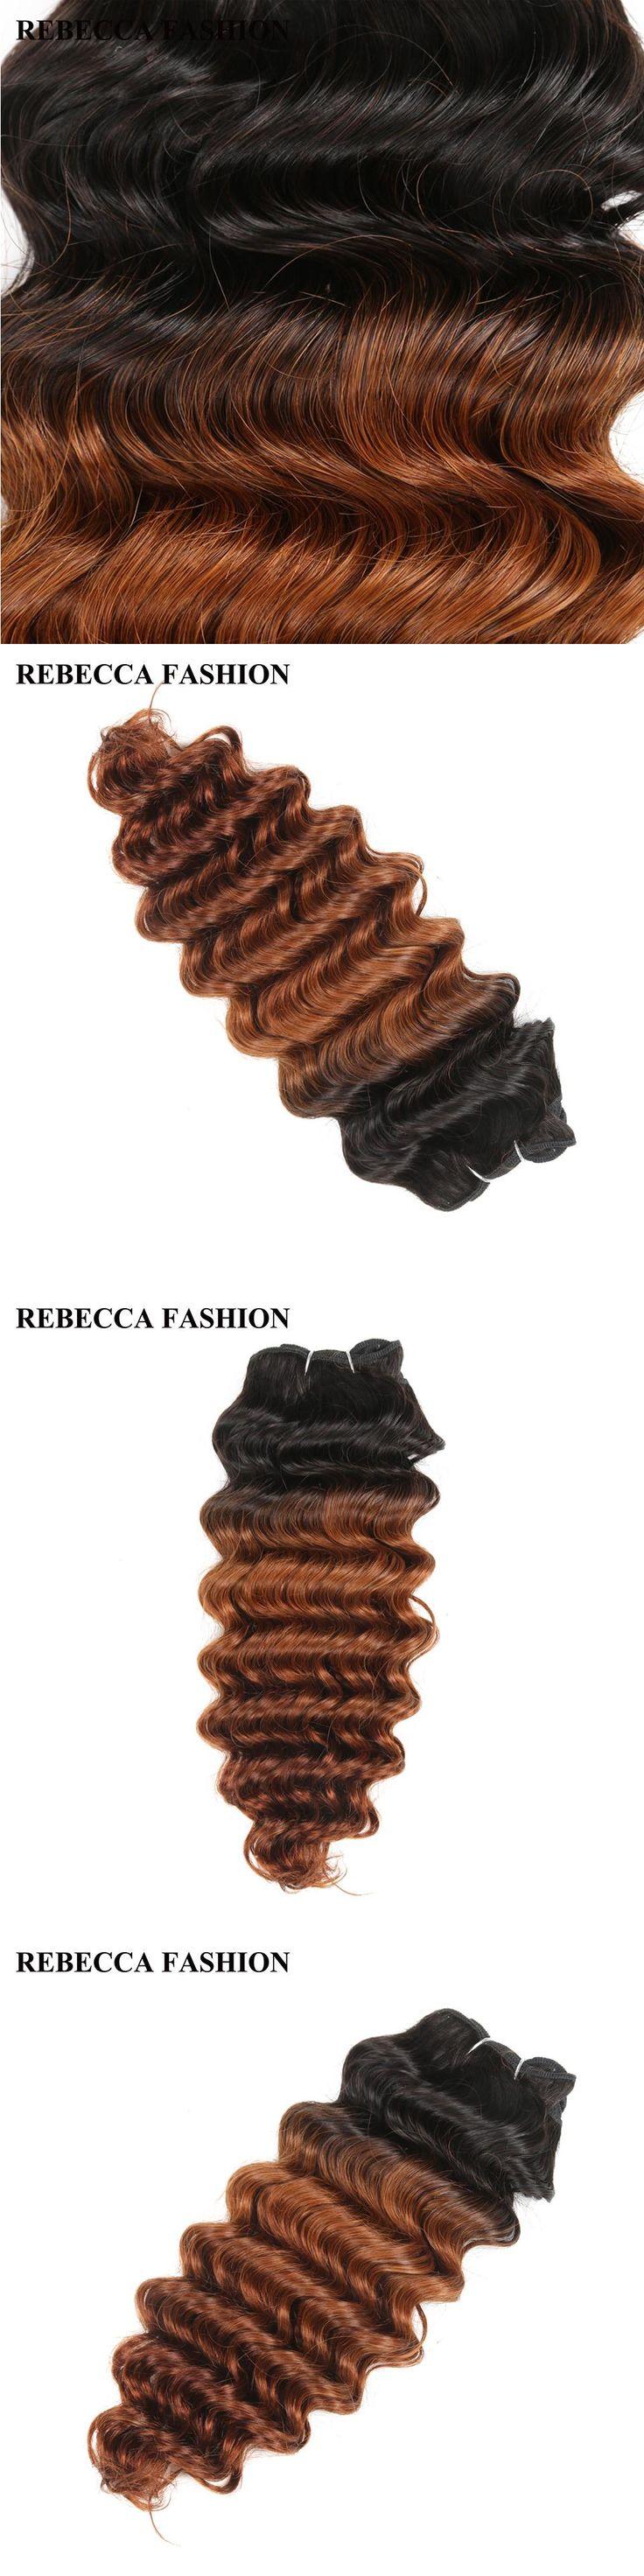 Rebecca remy Human Hair Brazilian Deep Wave Hair Weave bundles 100g  Ombre brown Salon Hair T1b30 High Ratio longest Hair PP 40%